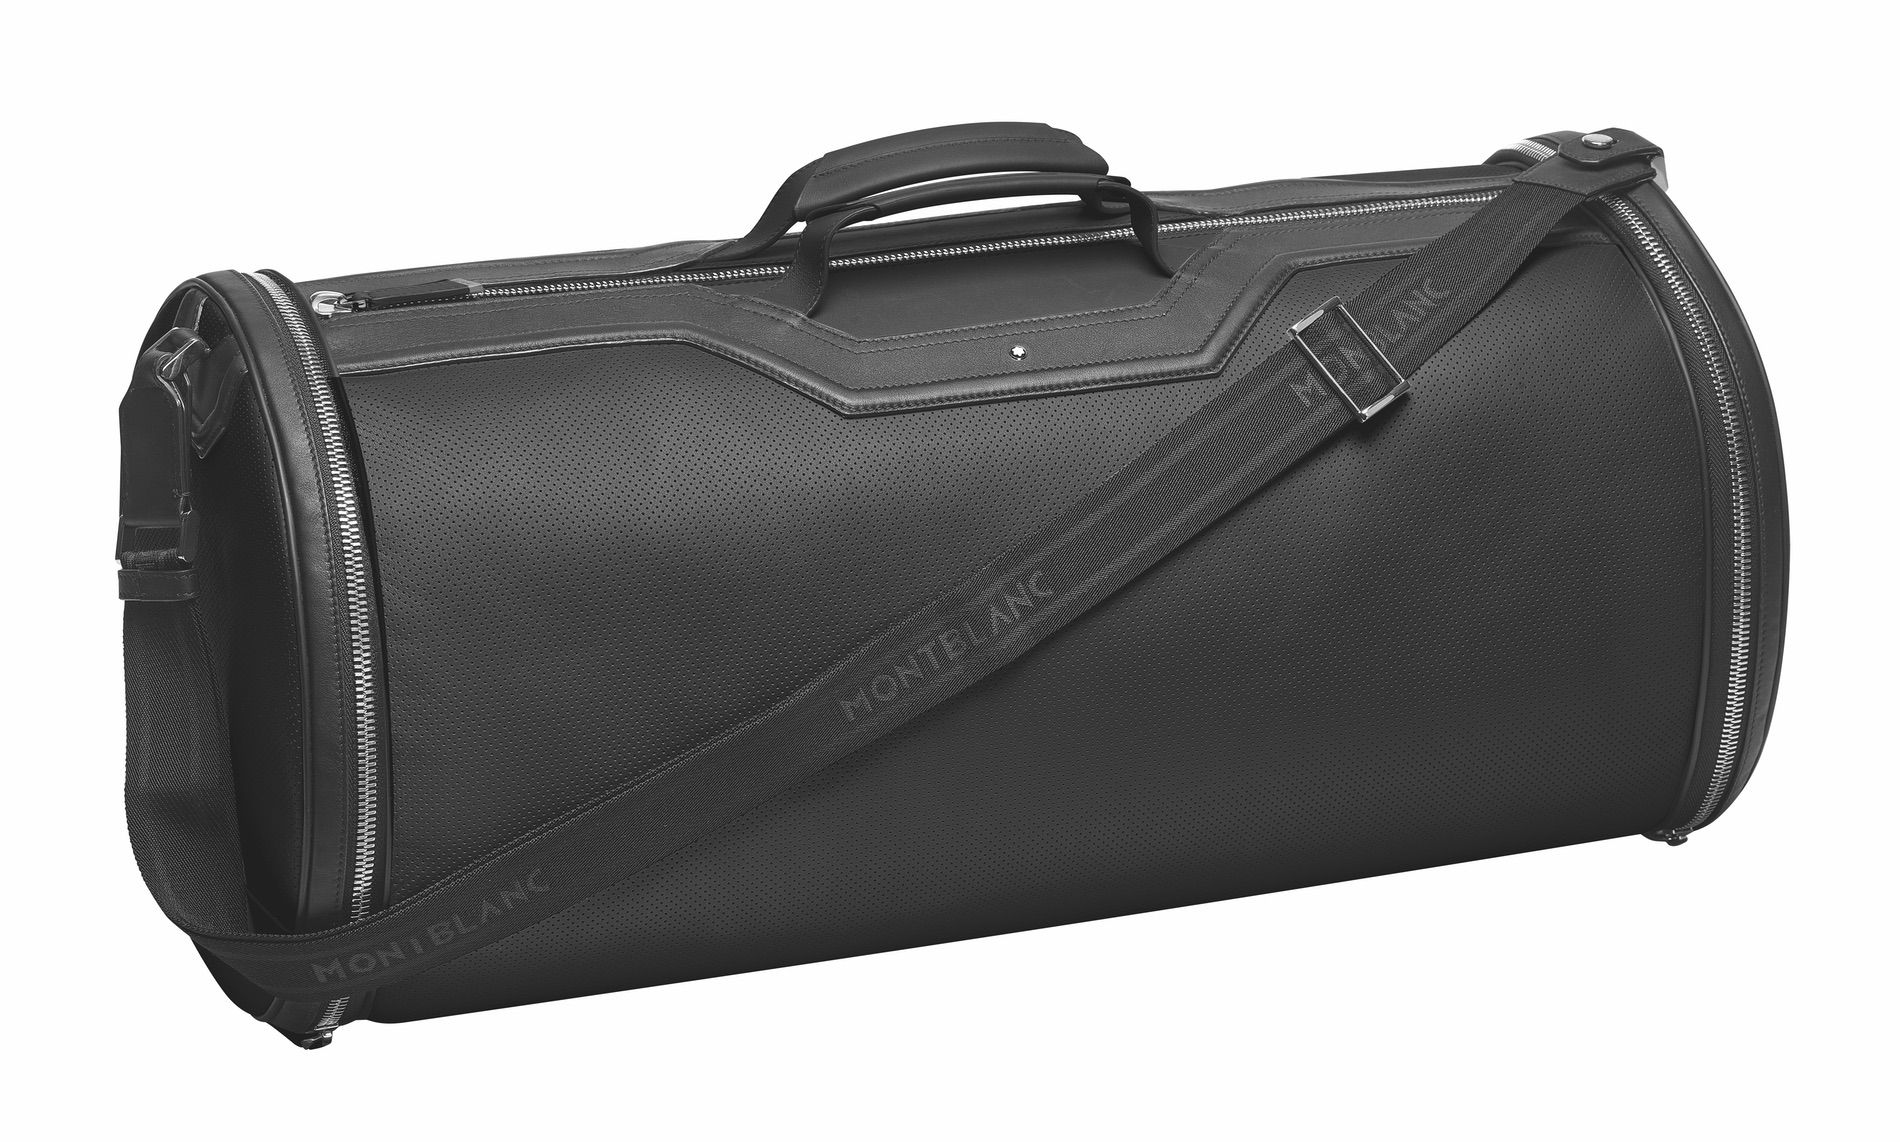 BMW Montblanc luggage 02